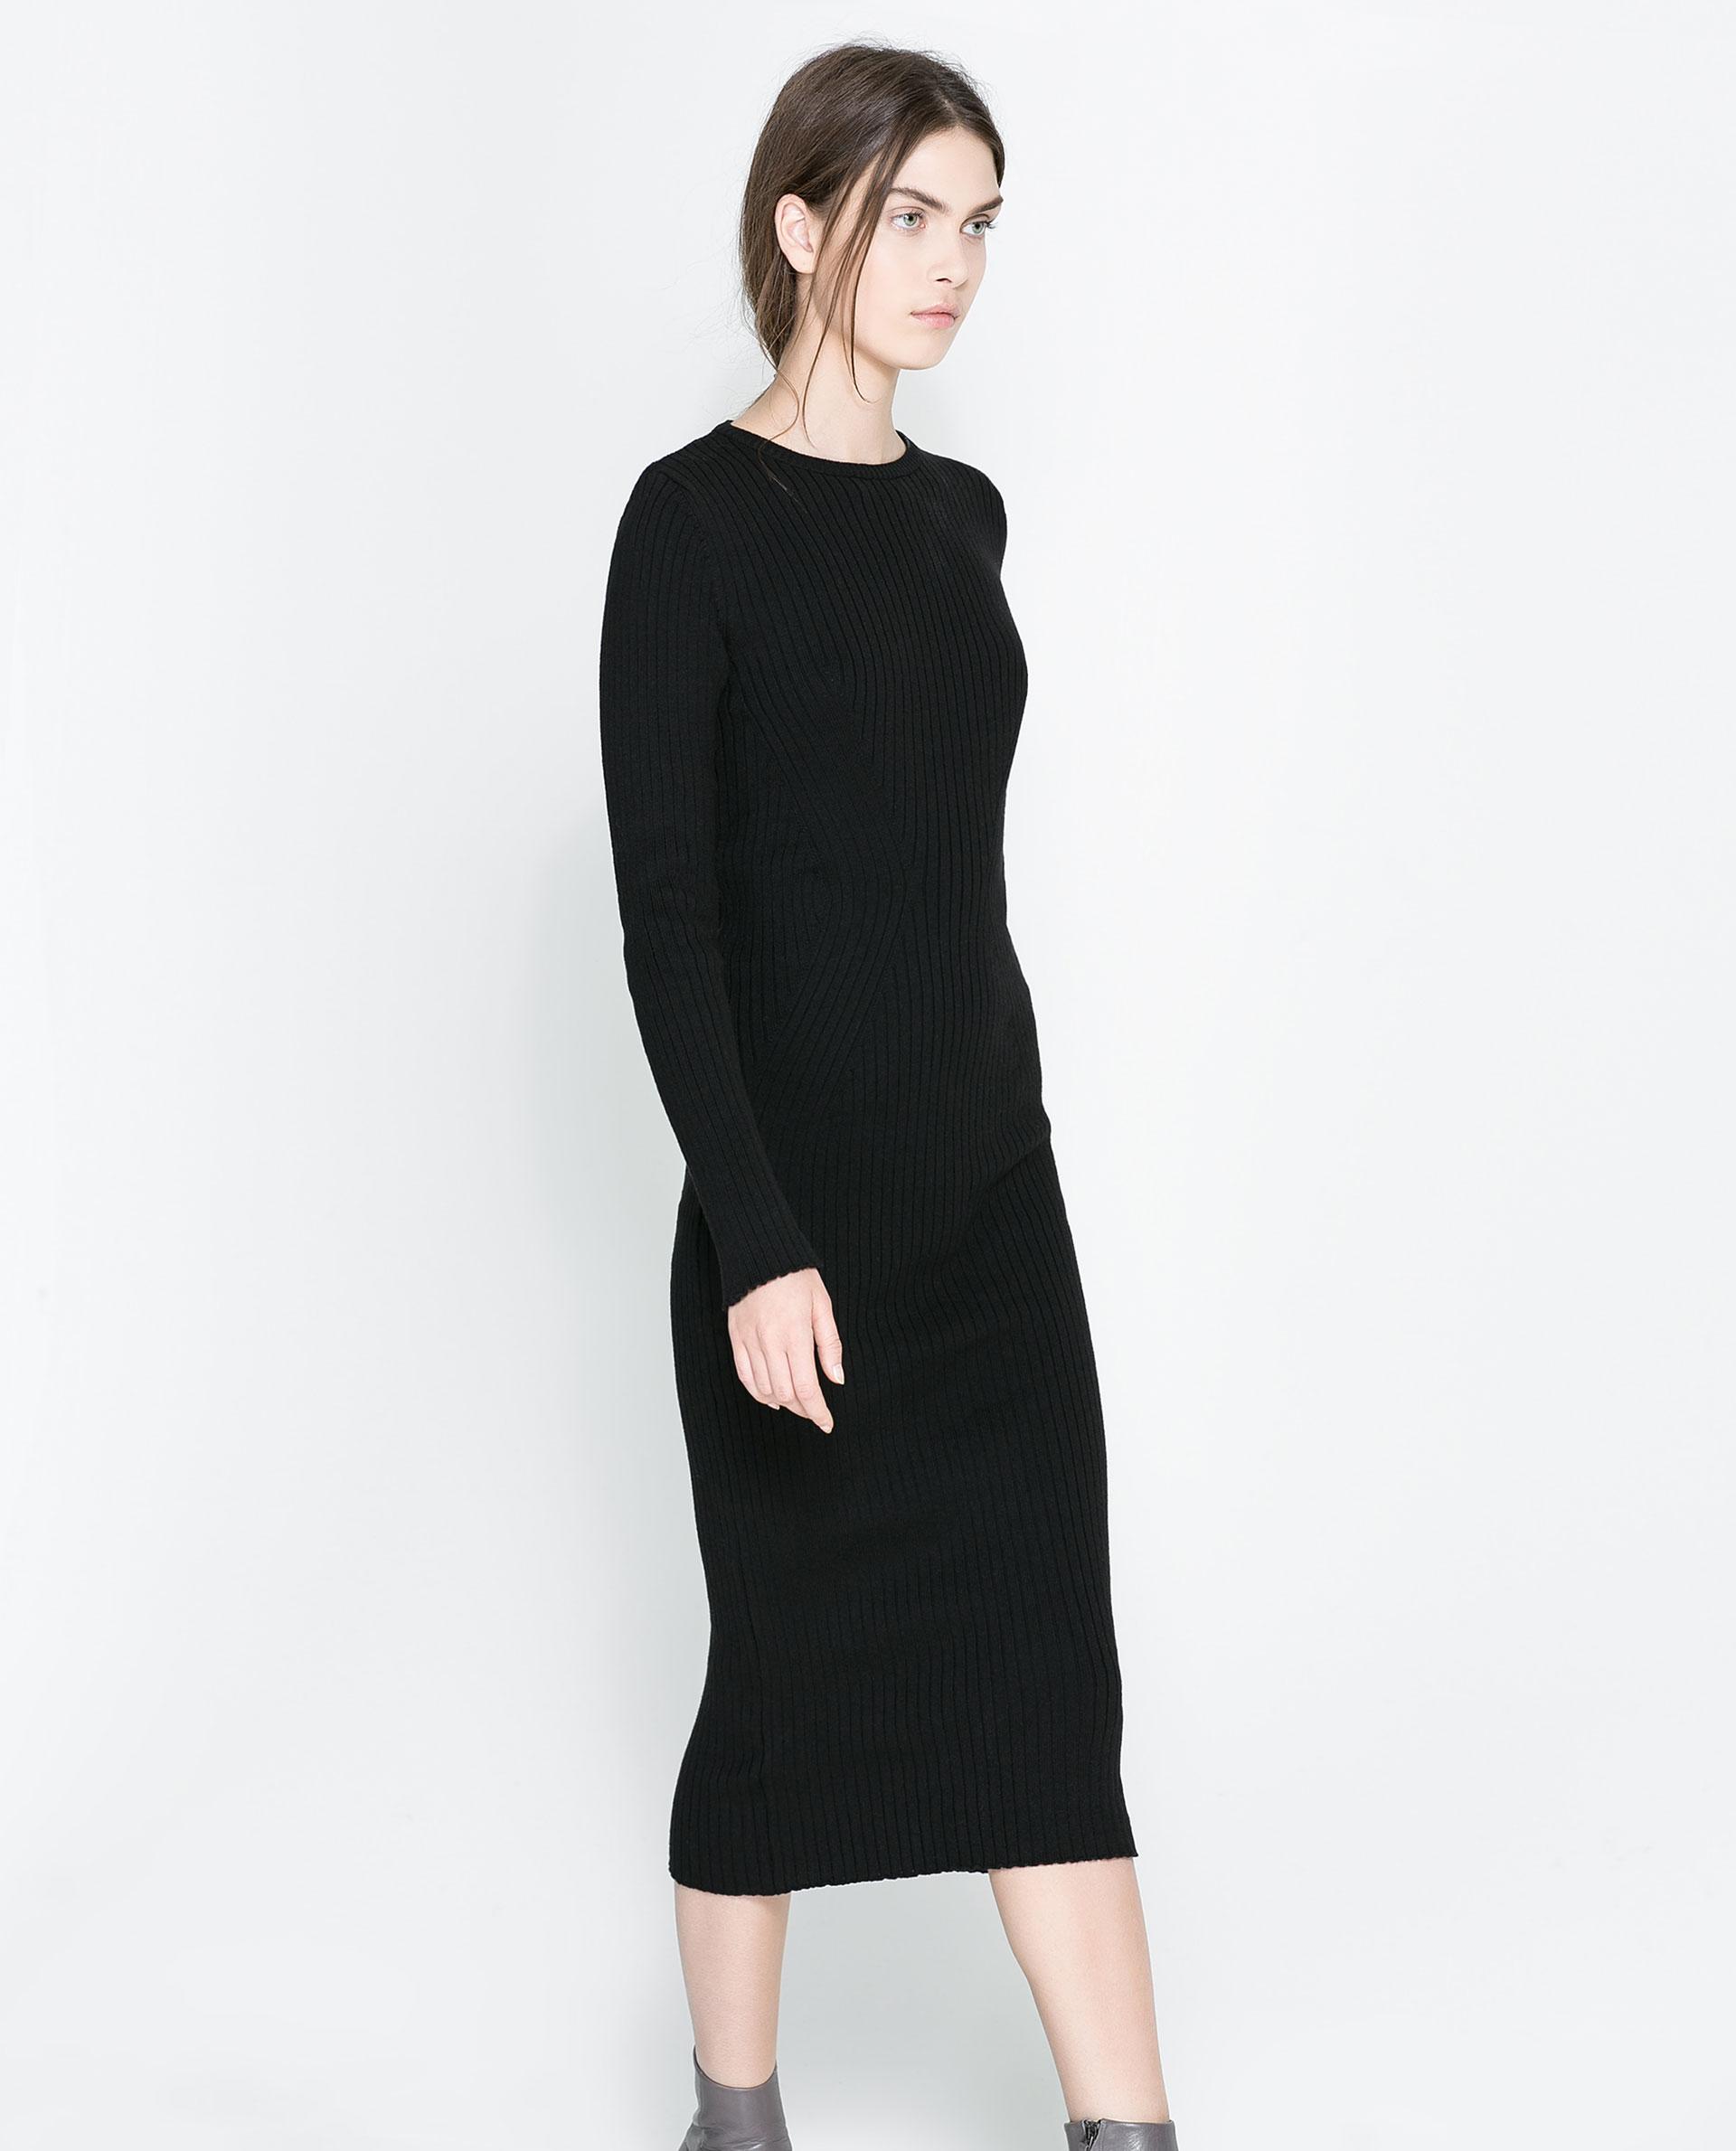 6613ccb39d52 long sleeve maxi dress zara | ivo hoogveld